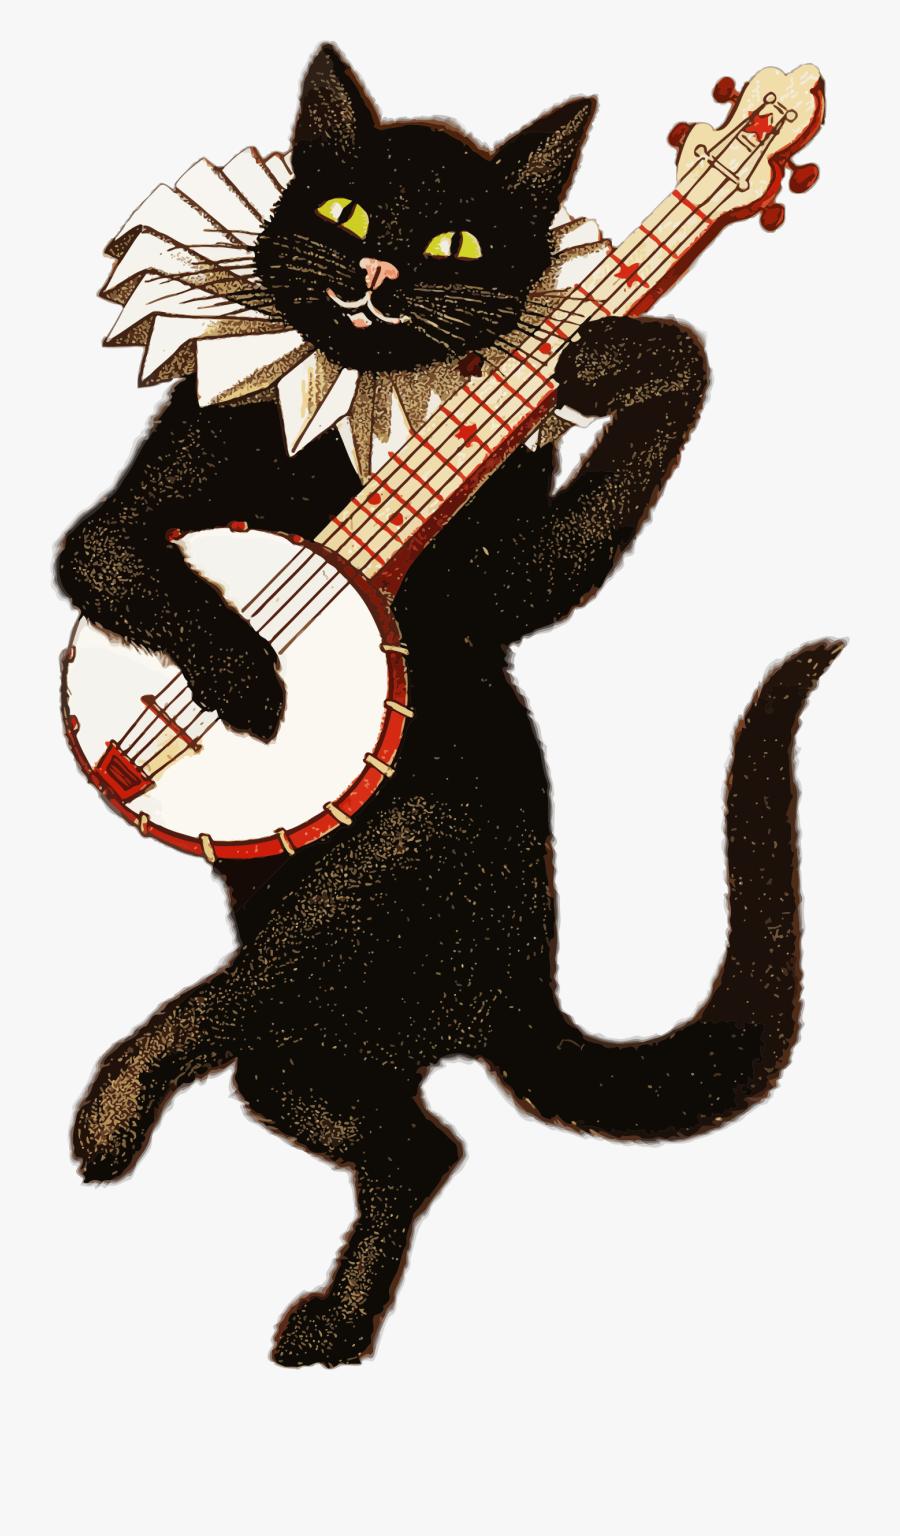 Vintage Cat Playing Banjo Transparent Png - Cat Playing Banjo, Transparent Clipart